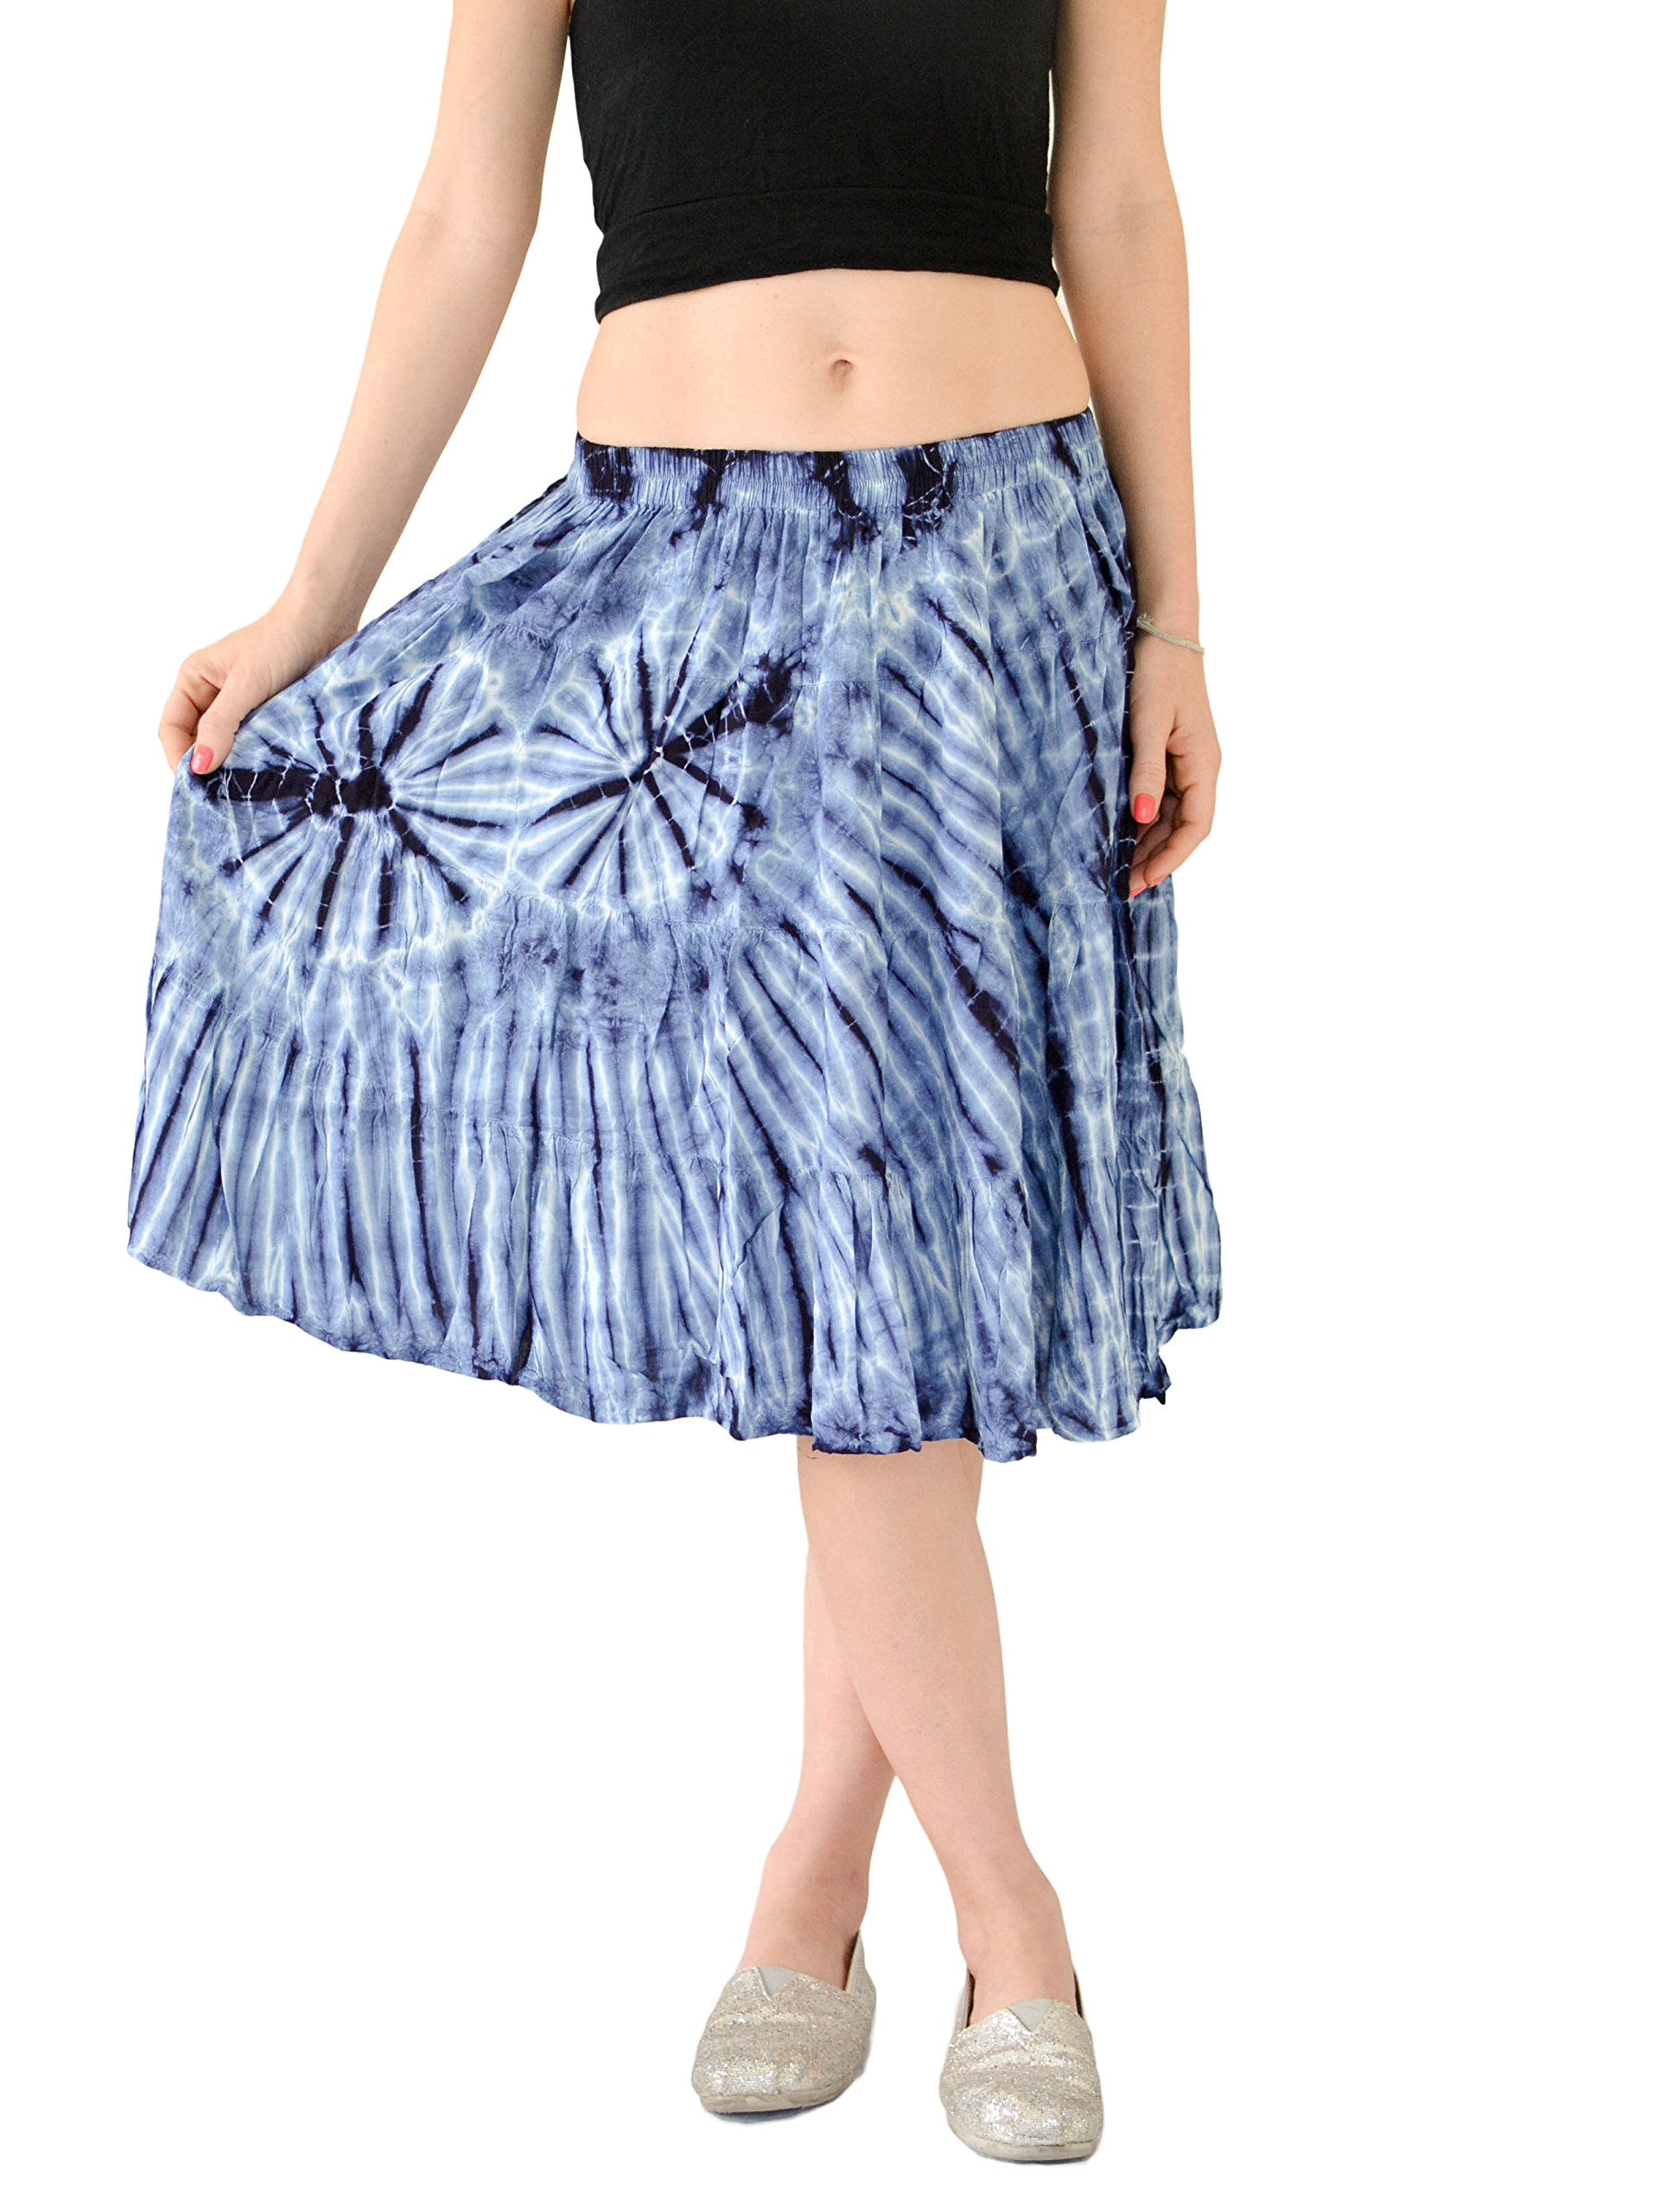 Orient Trail Women's Hippie Bohemian Boho Tie Dye Knee Length Mini Skirt M/L Dark Shibori Blue by Orient Trail (Image #1)